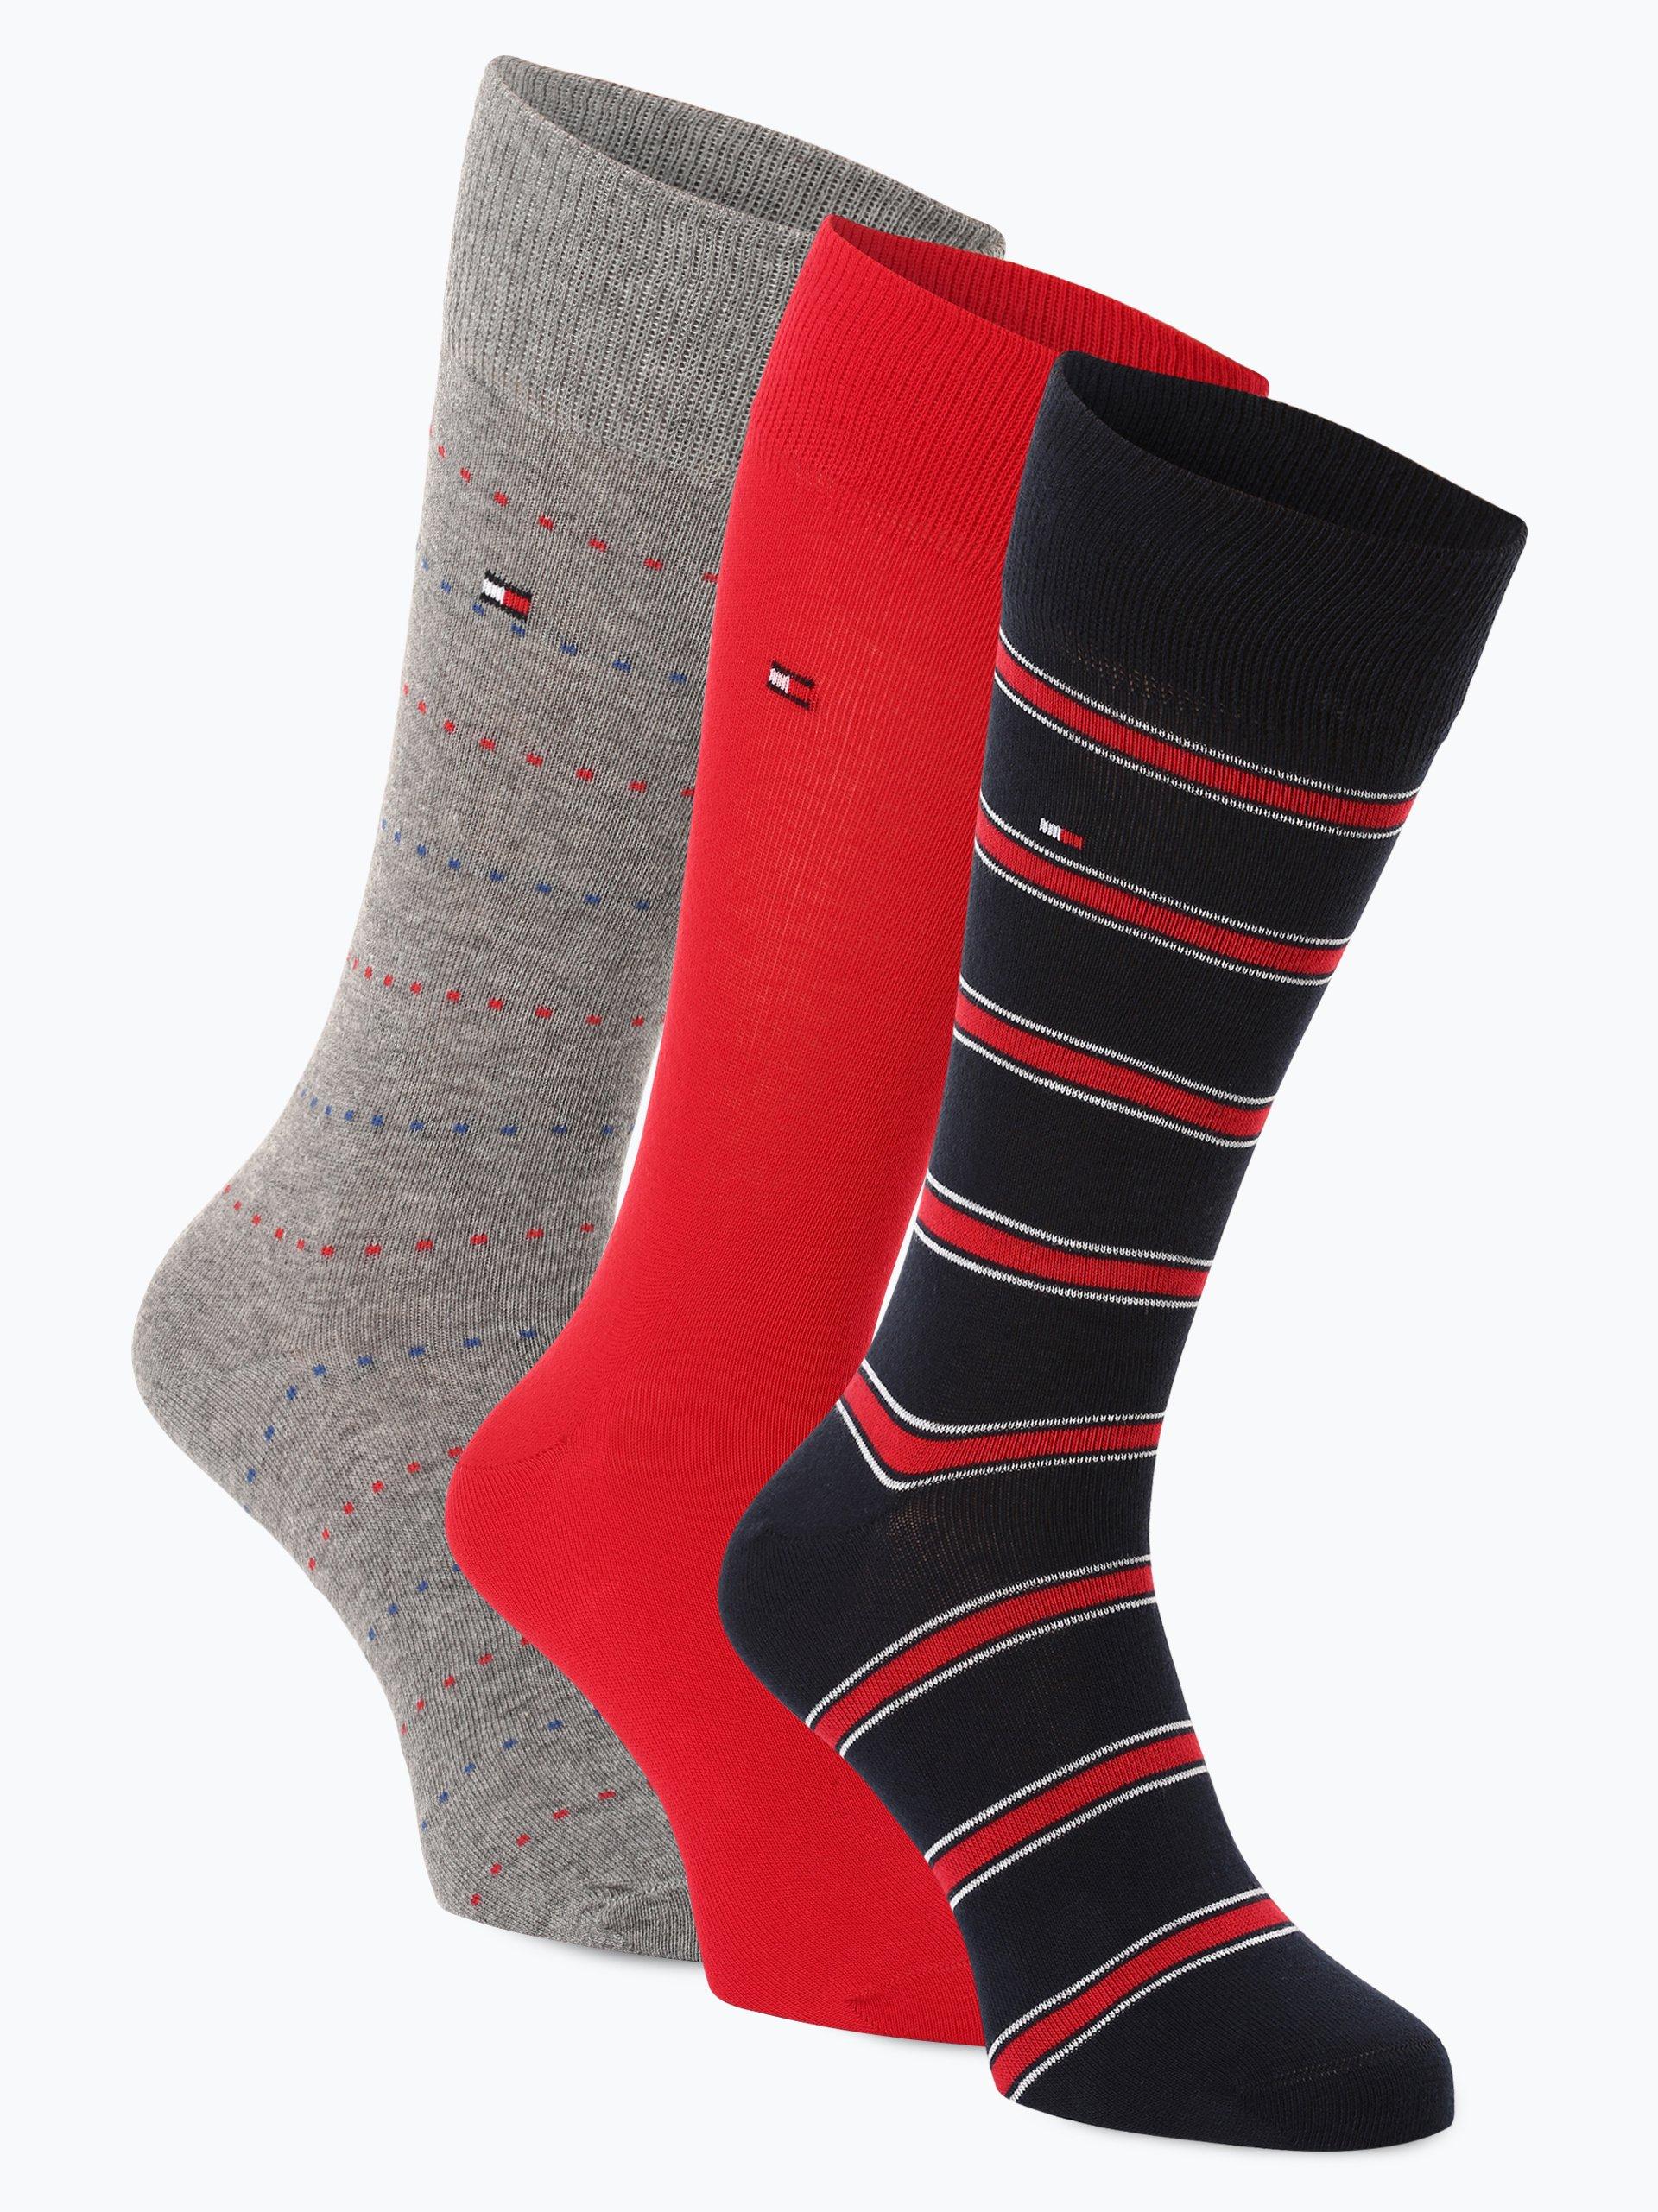 Tommy Hilfiger Herren Socken im 3er-Pack